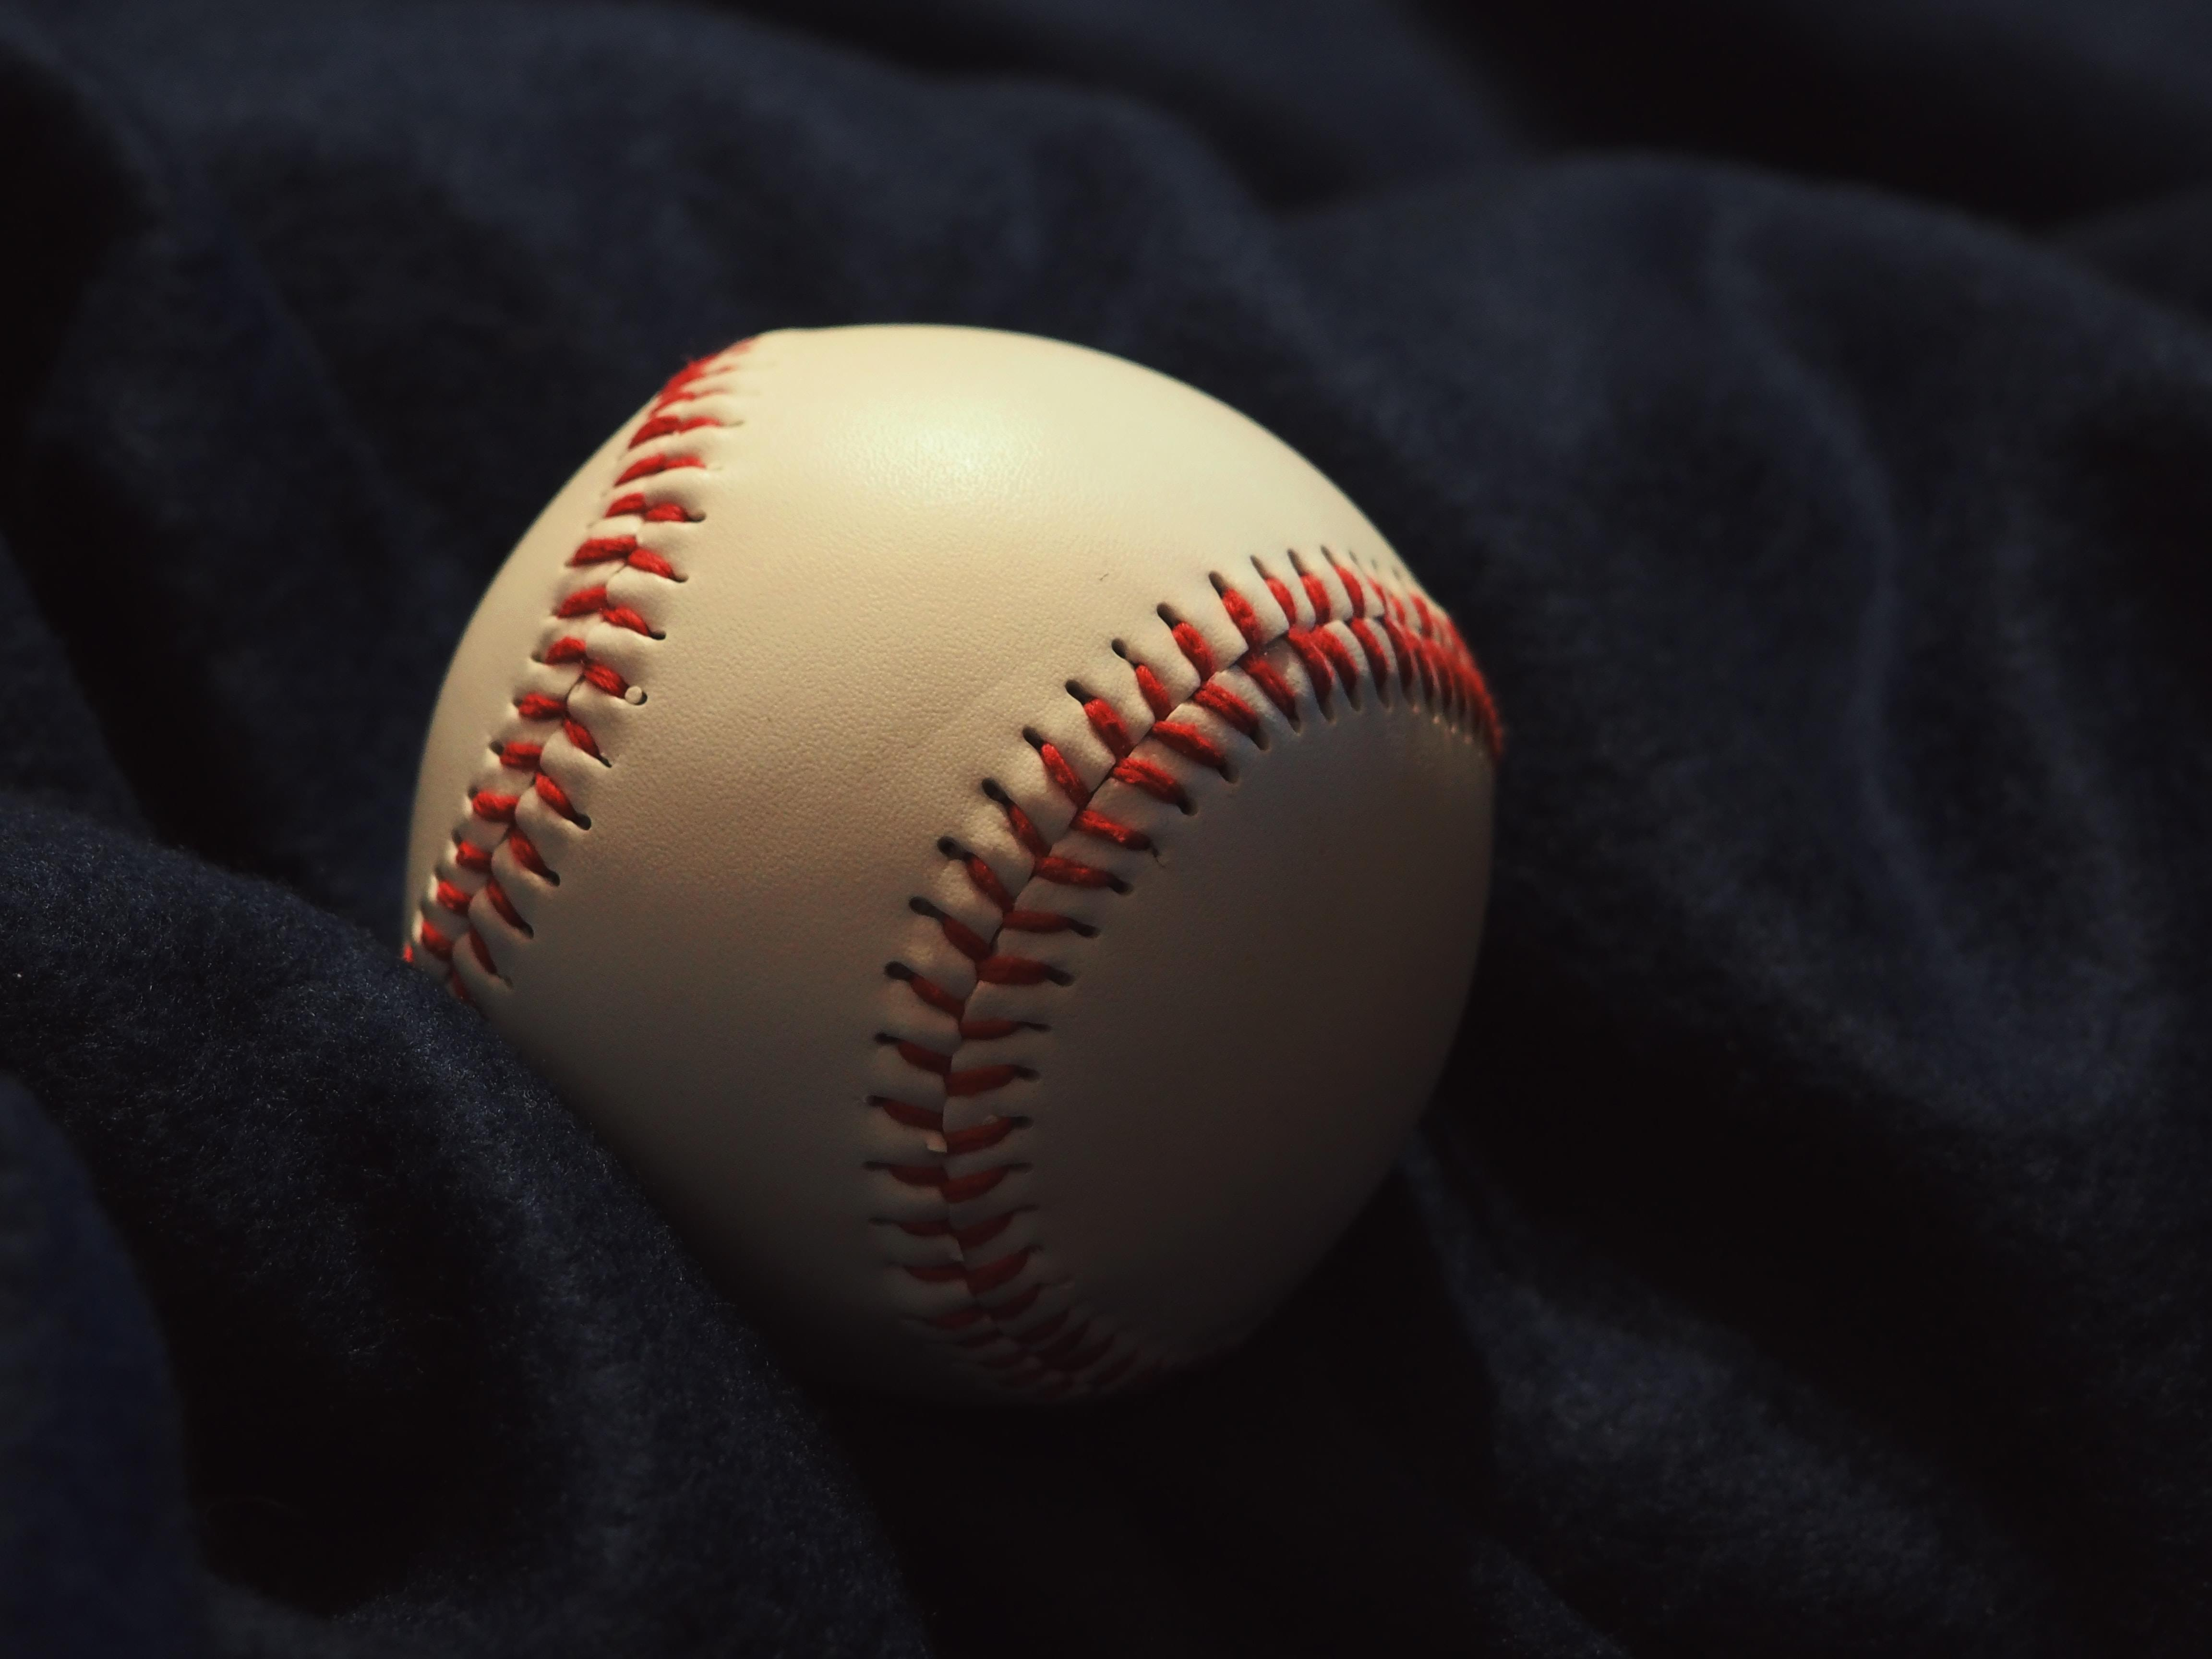 NASH Nine: Get the most out of Baseball Season